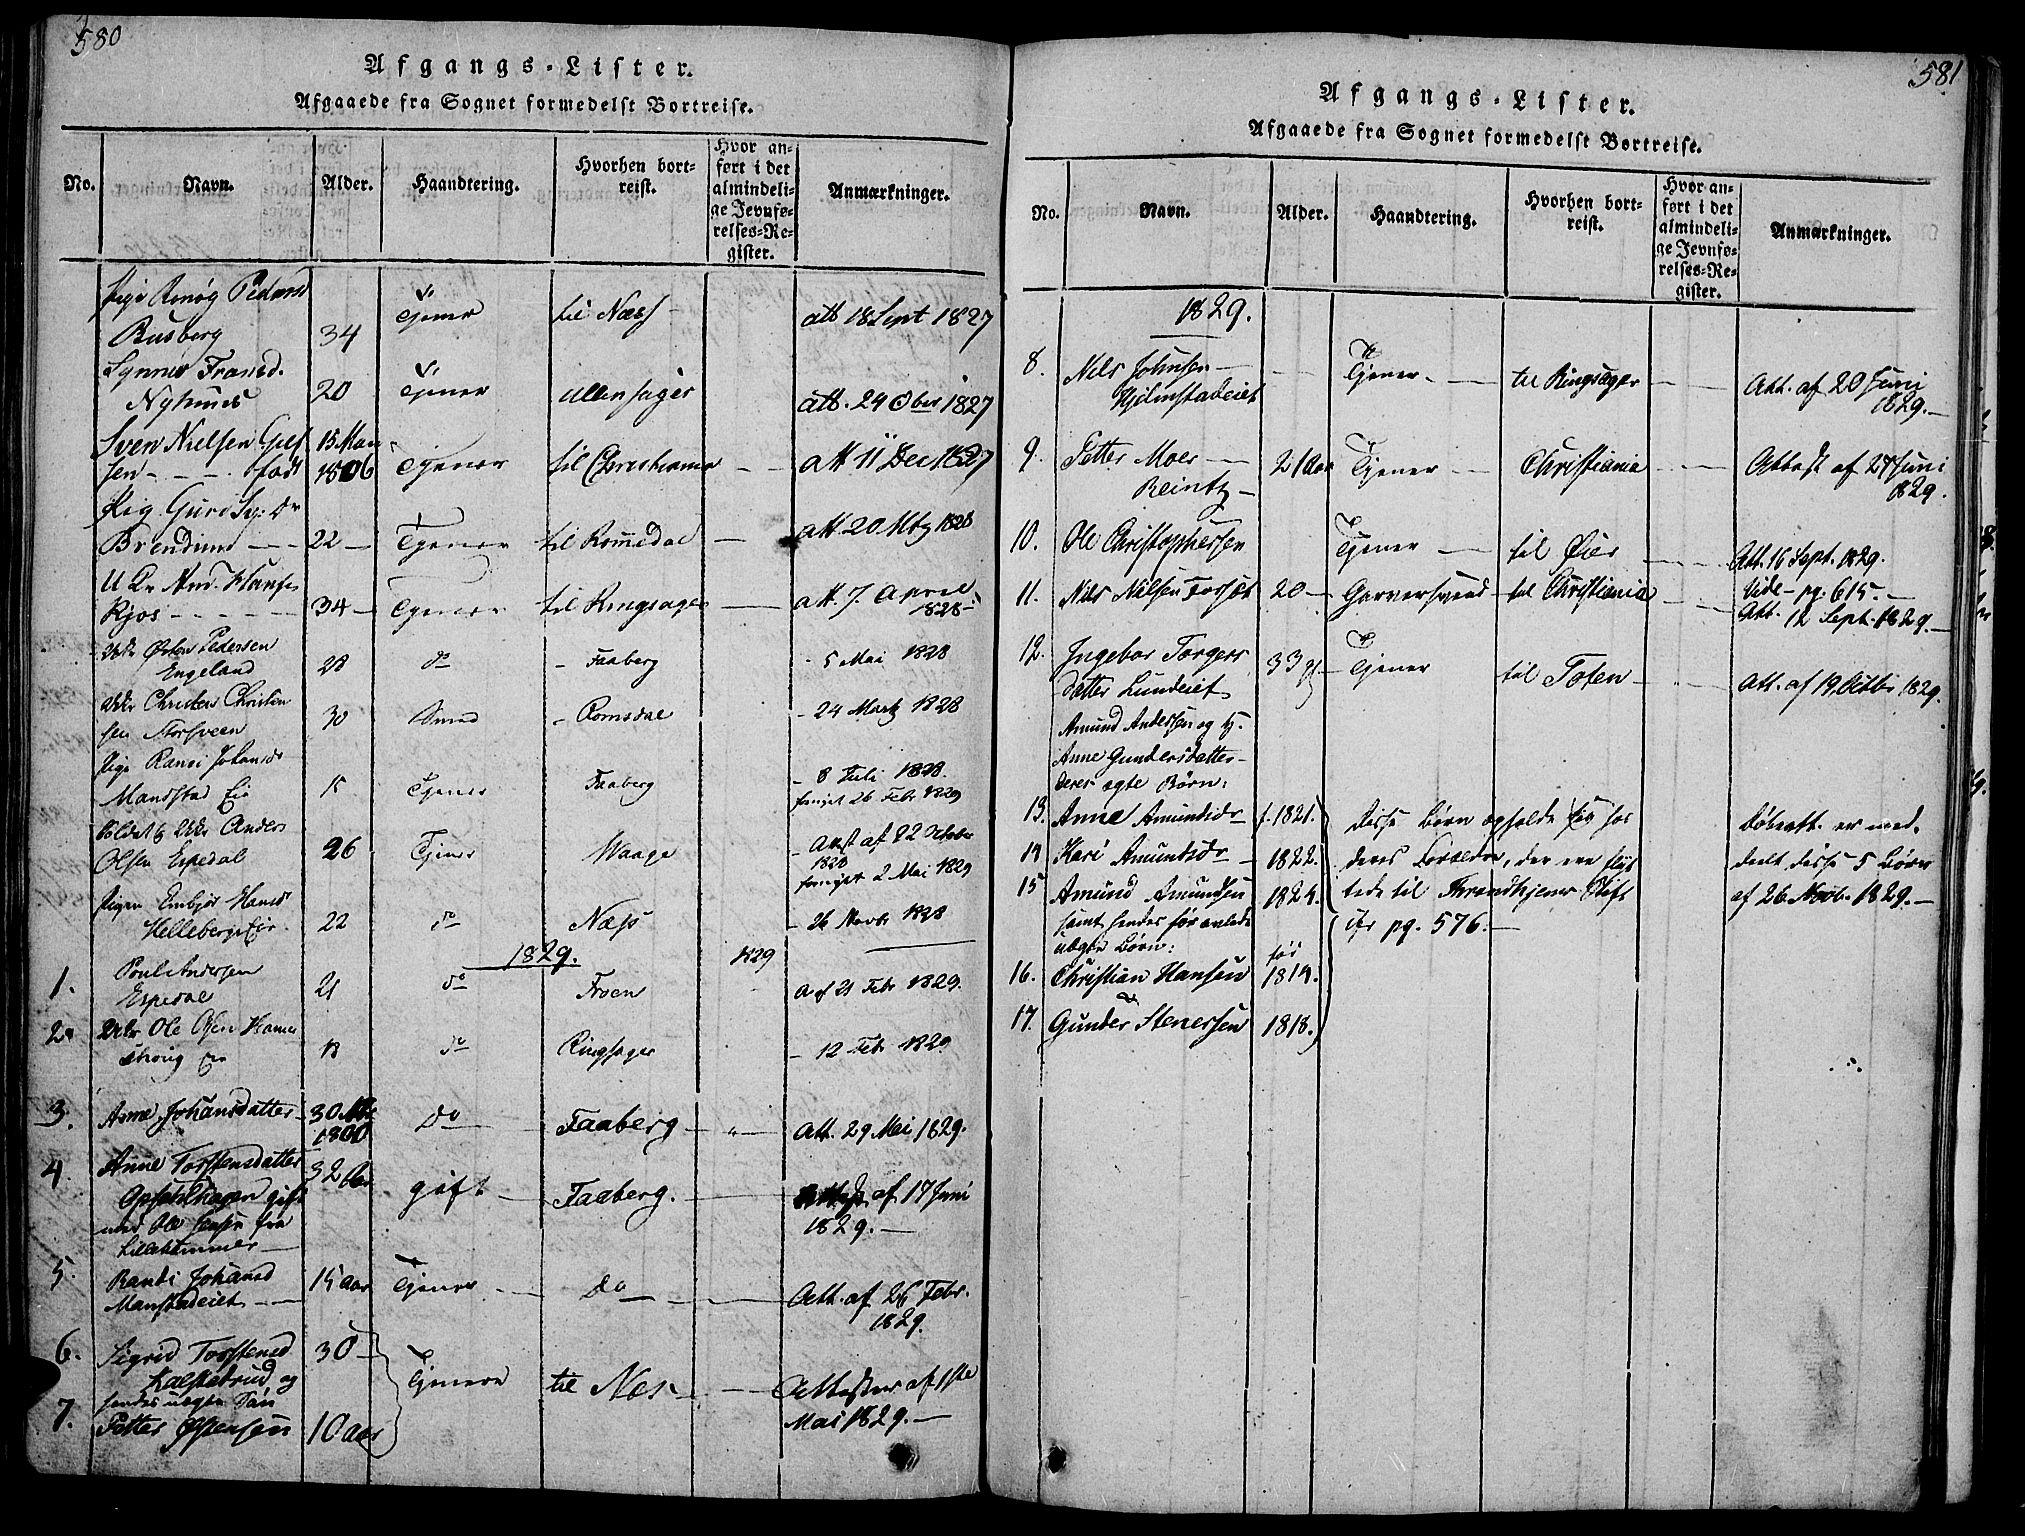 SAH, Gausdal prestekontor, Ministerialbok nr. 5, 1817-1829, s. 580-581